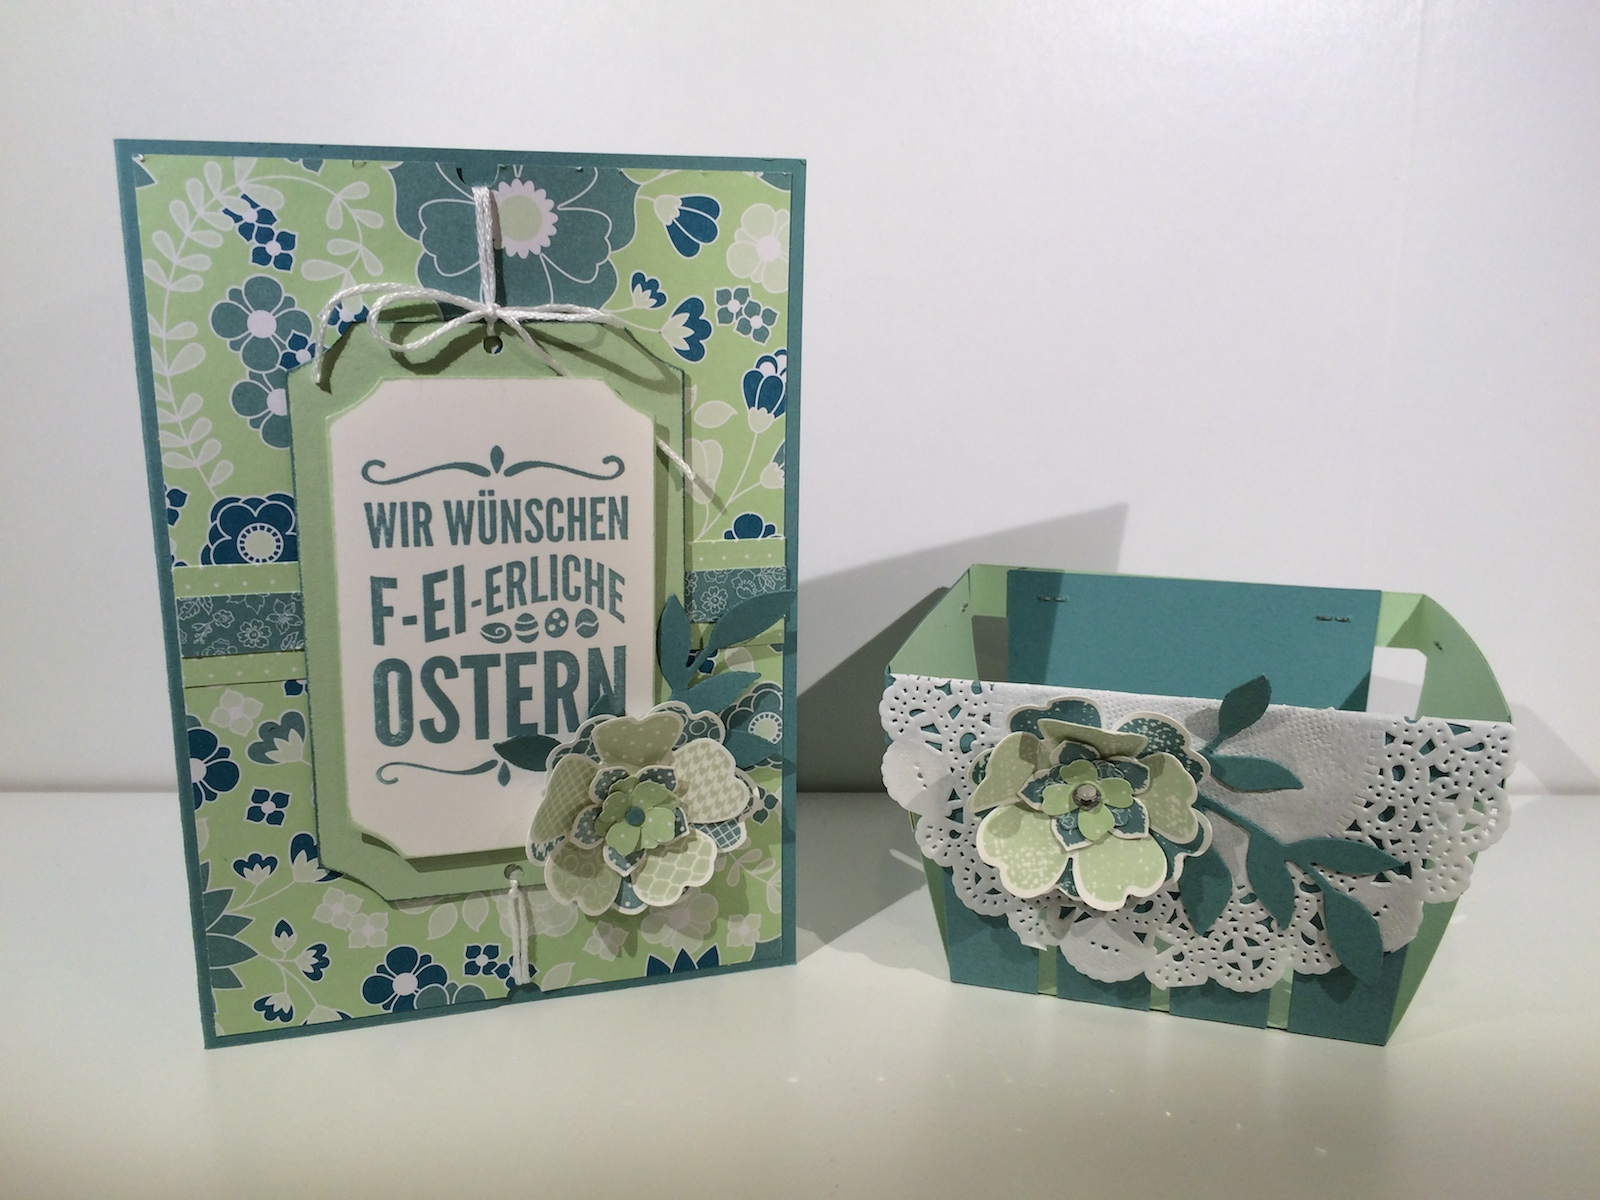 Stampin up Osterkarte Körbchen Berry Basket Eastercard Ei,ei,ei! For Peeps Sake Flowershop Petit Petals Aufgeblüht, All Abloom